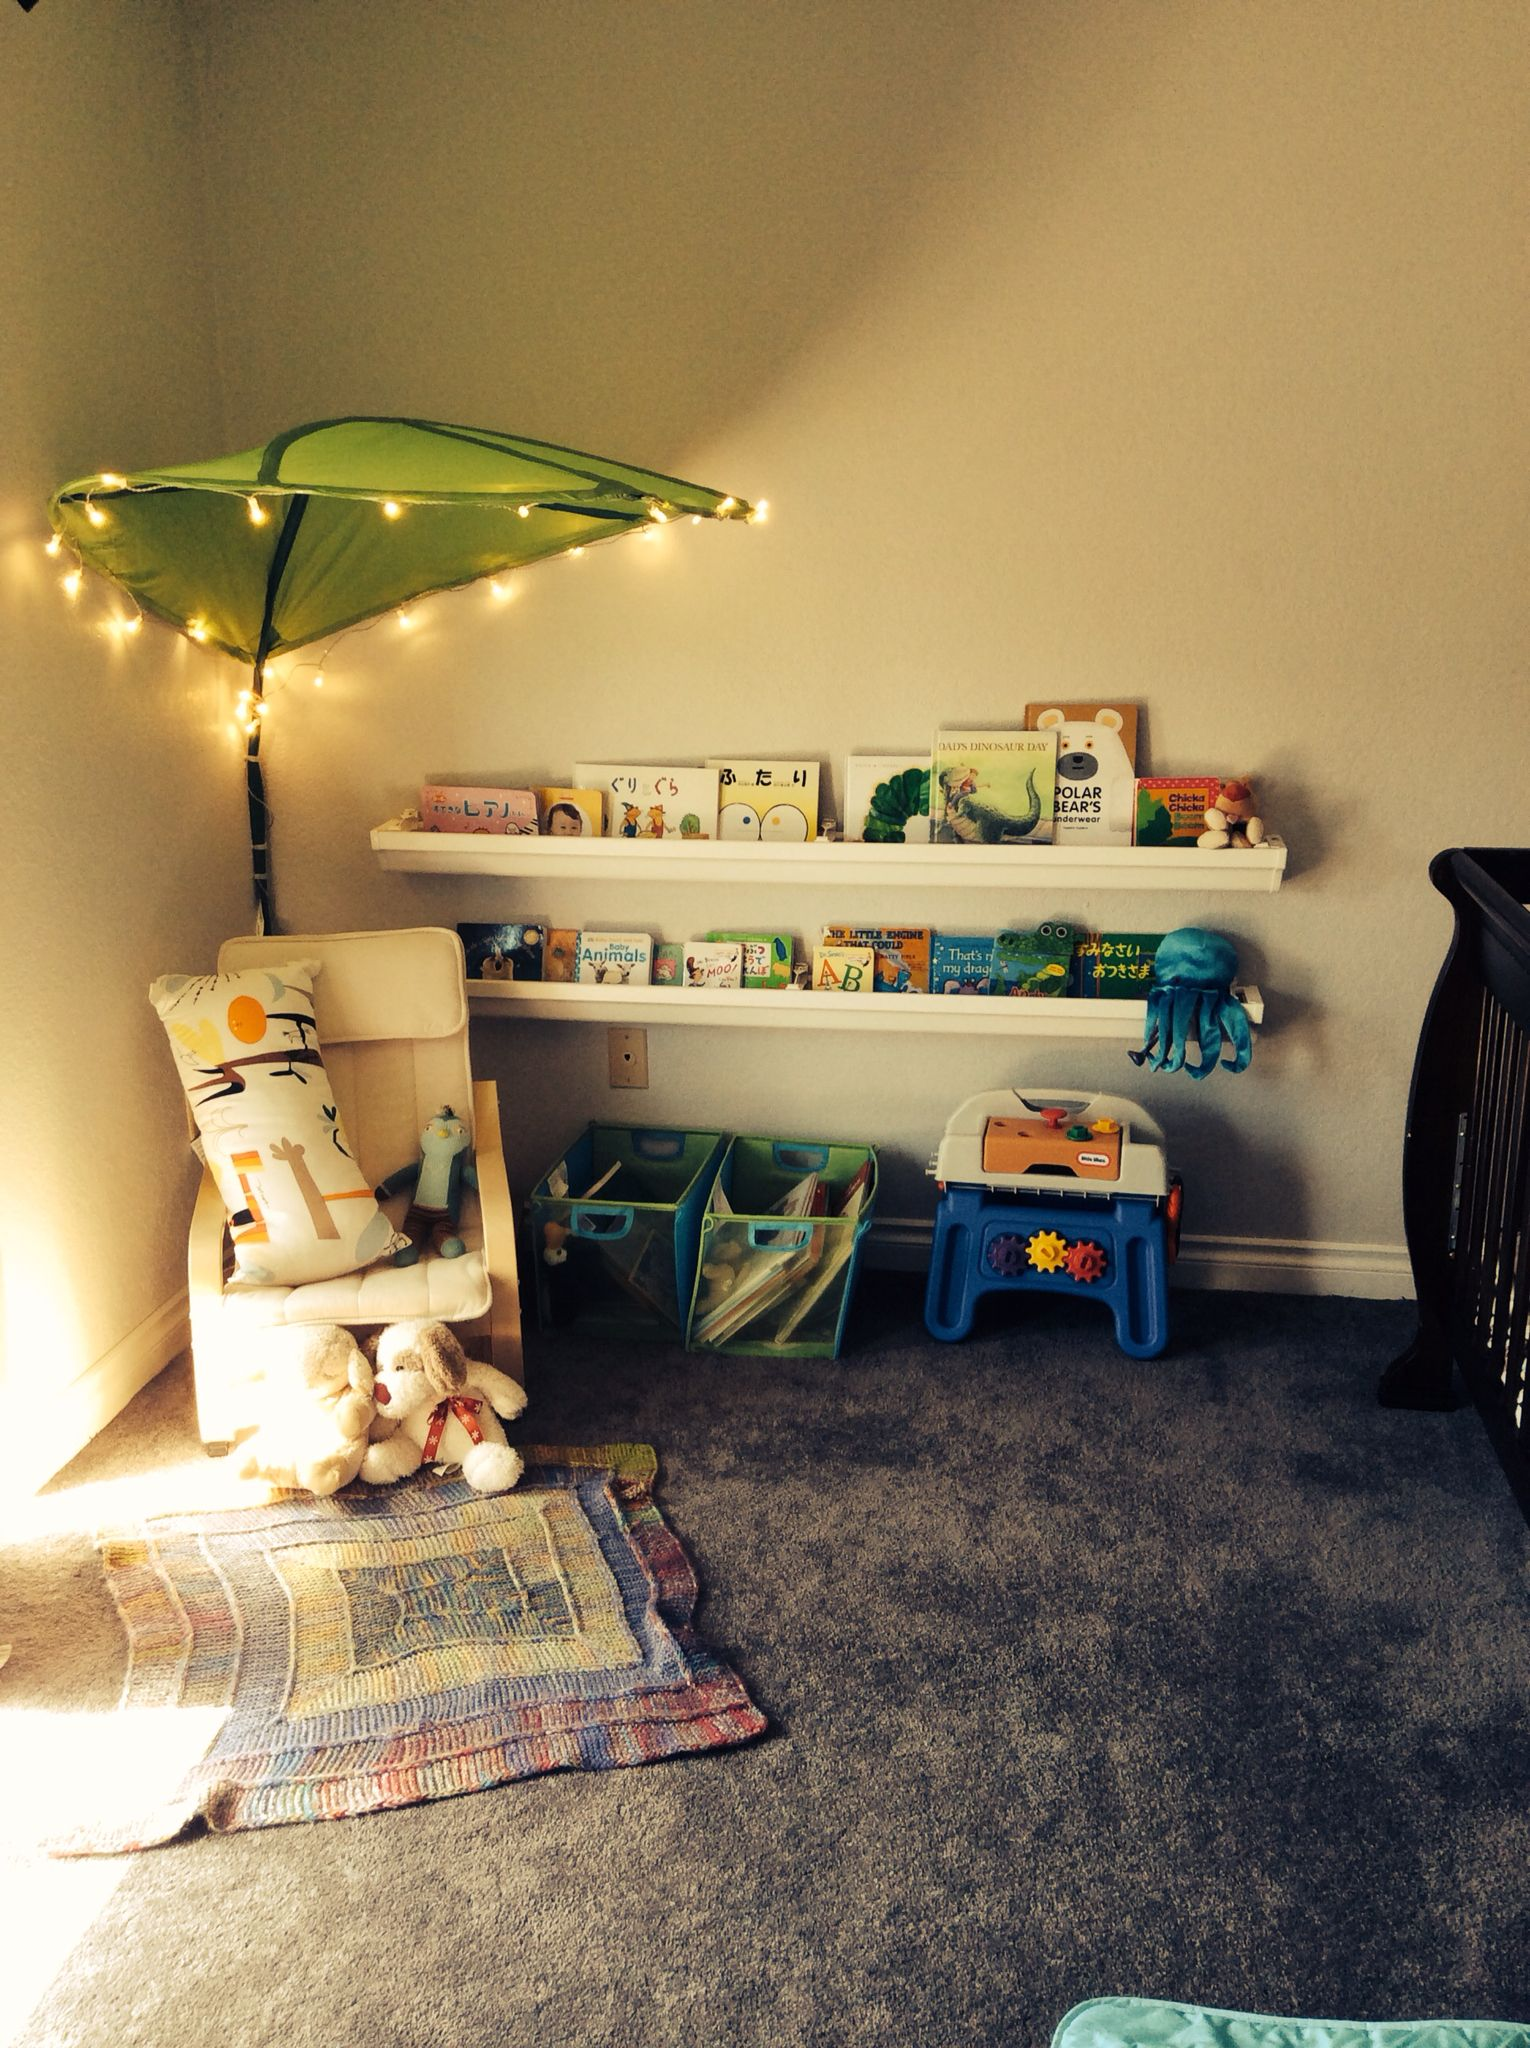 Kids playroom canopy - Rain Gutter Book Shelf Ikea Leaf Canopy Decorated With String Lights Playroom Organizationplayroom Ideasbook